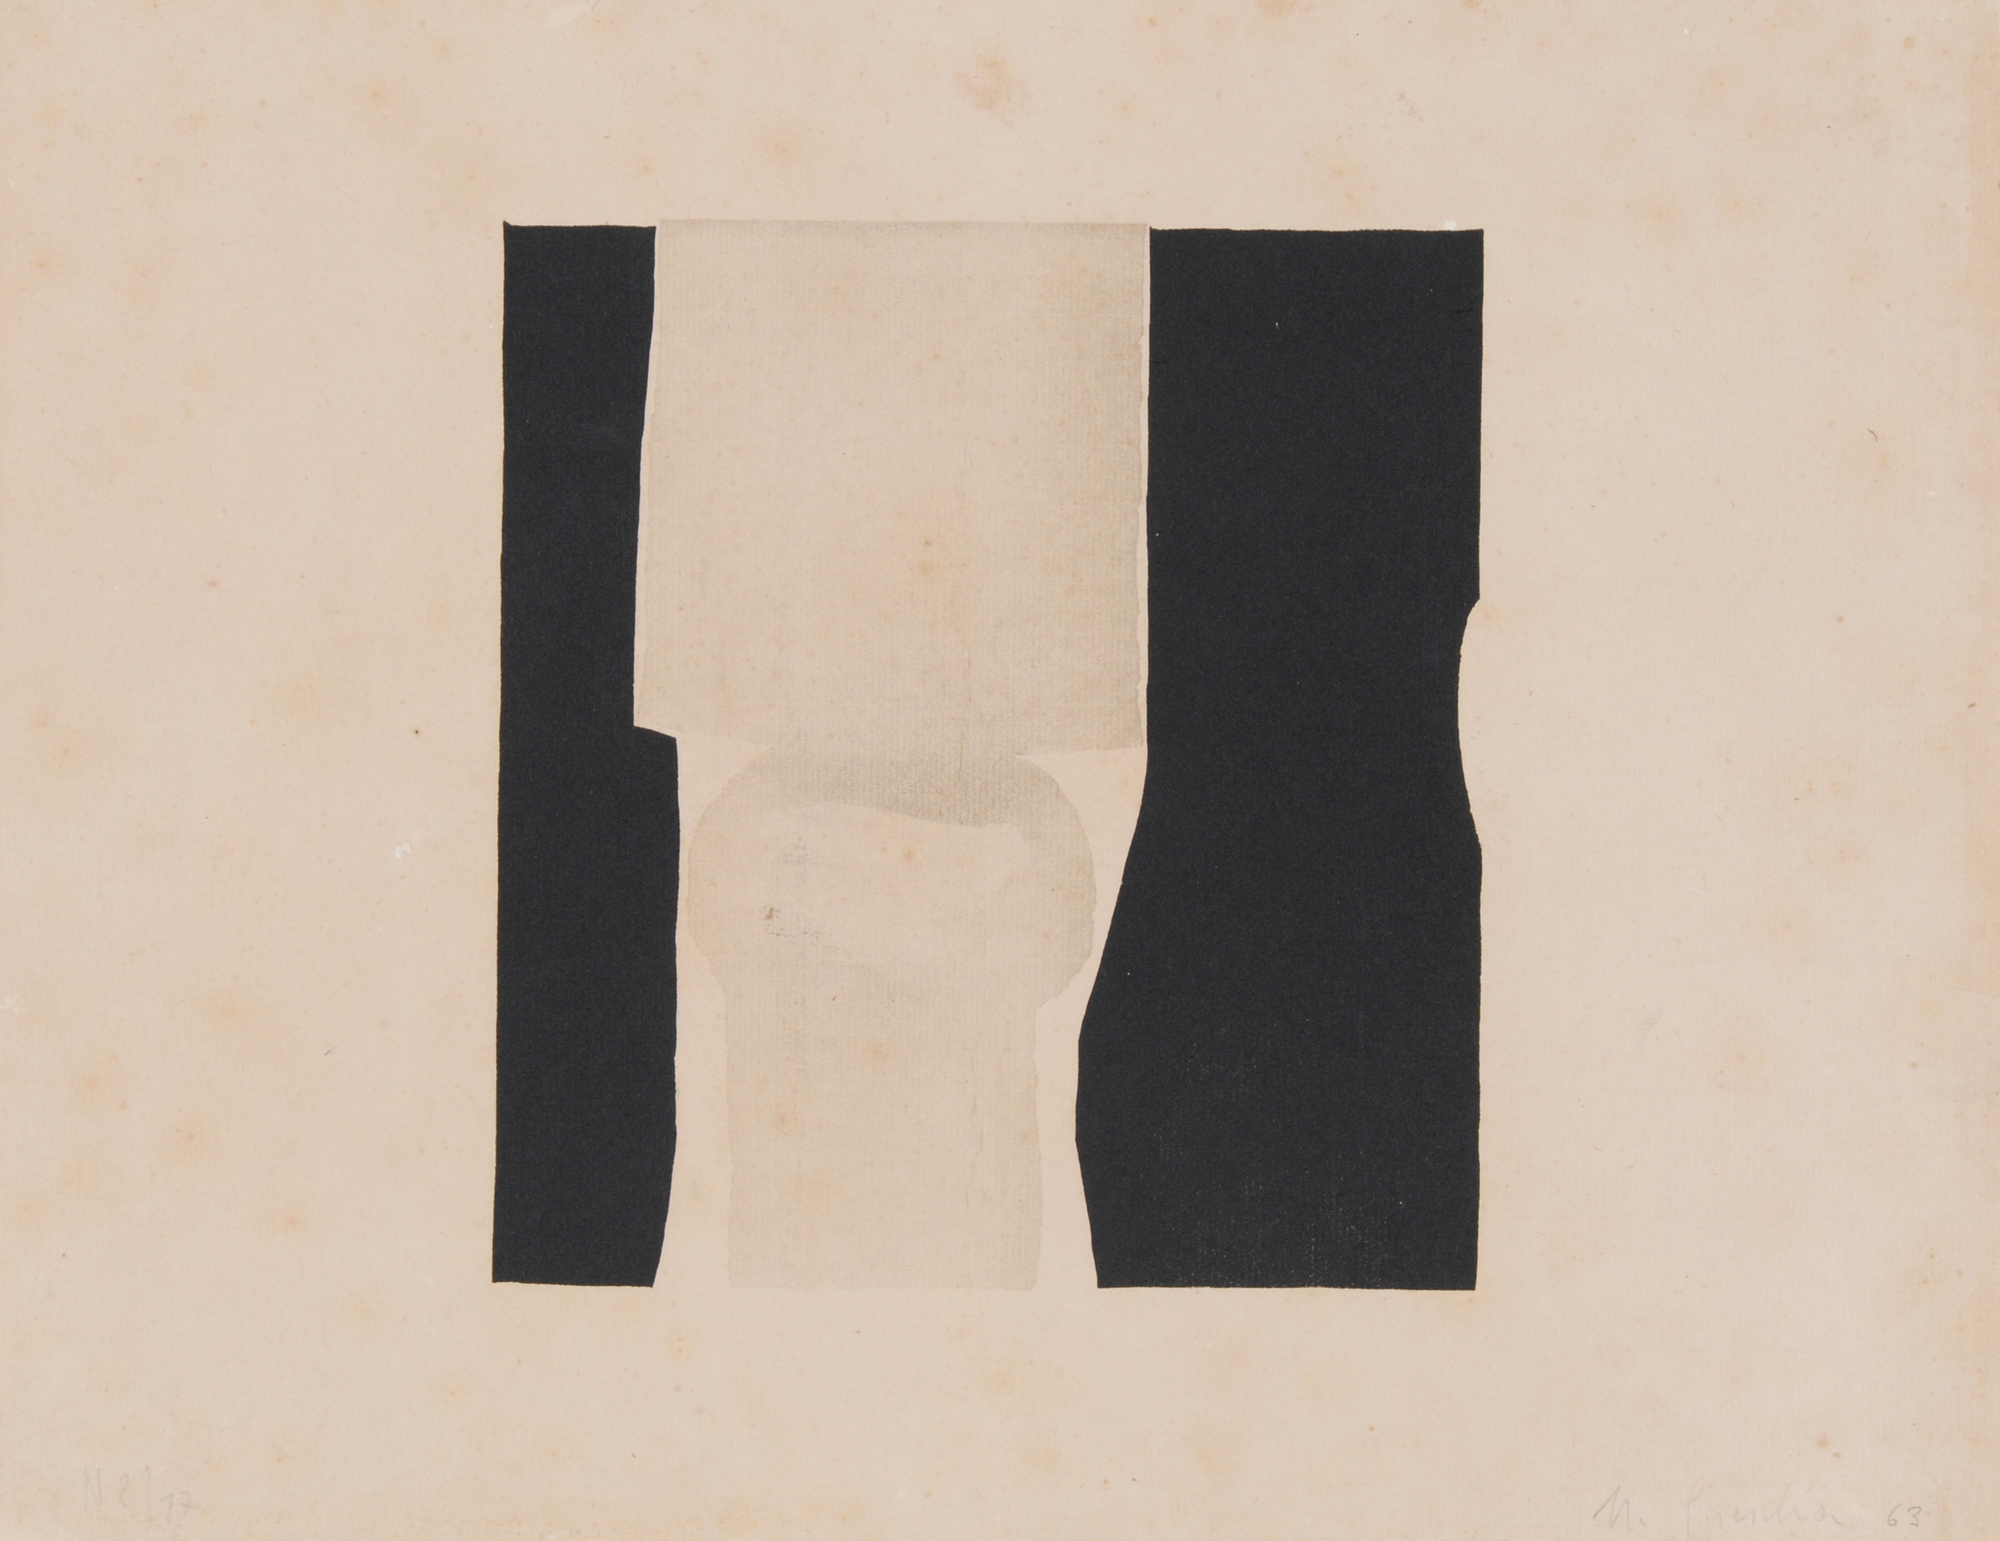 Spescha Matias, 8 sheets: Linocut-Series, 1963/1-3; Untitled, 1972/1; Untitled, 1979/2 (4)